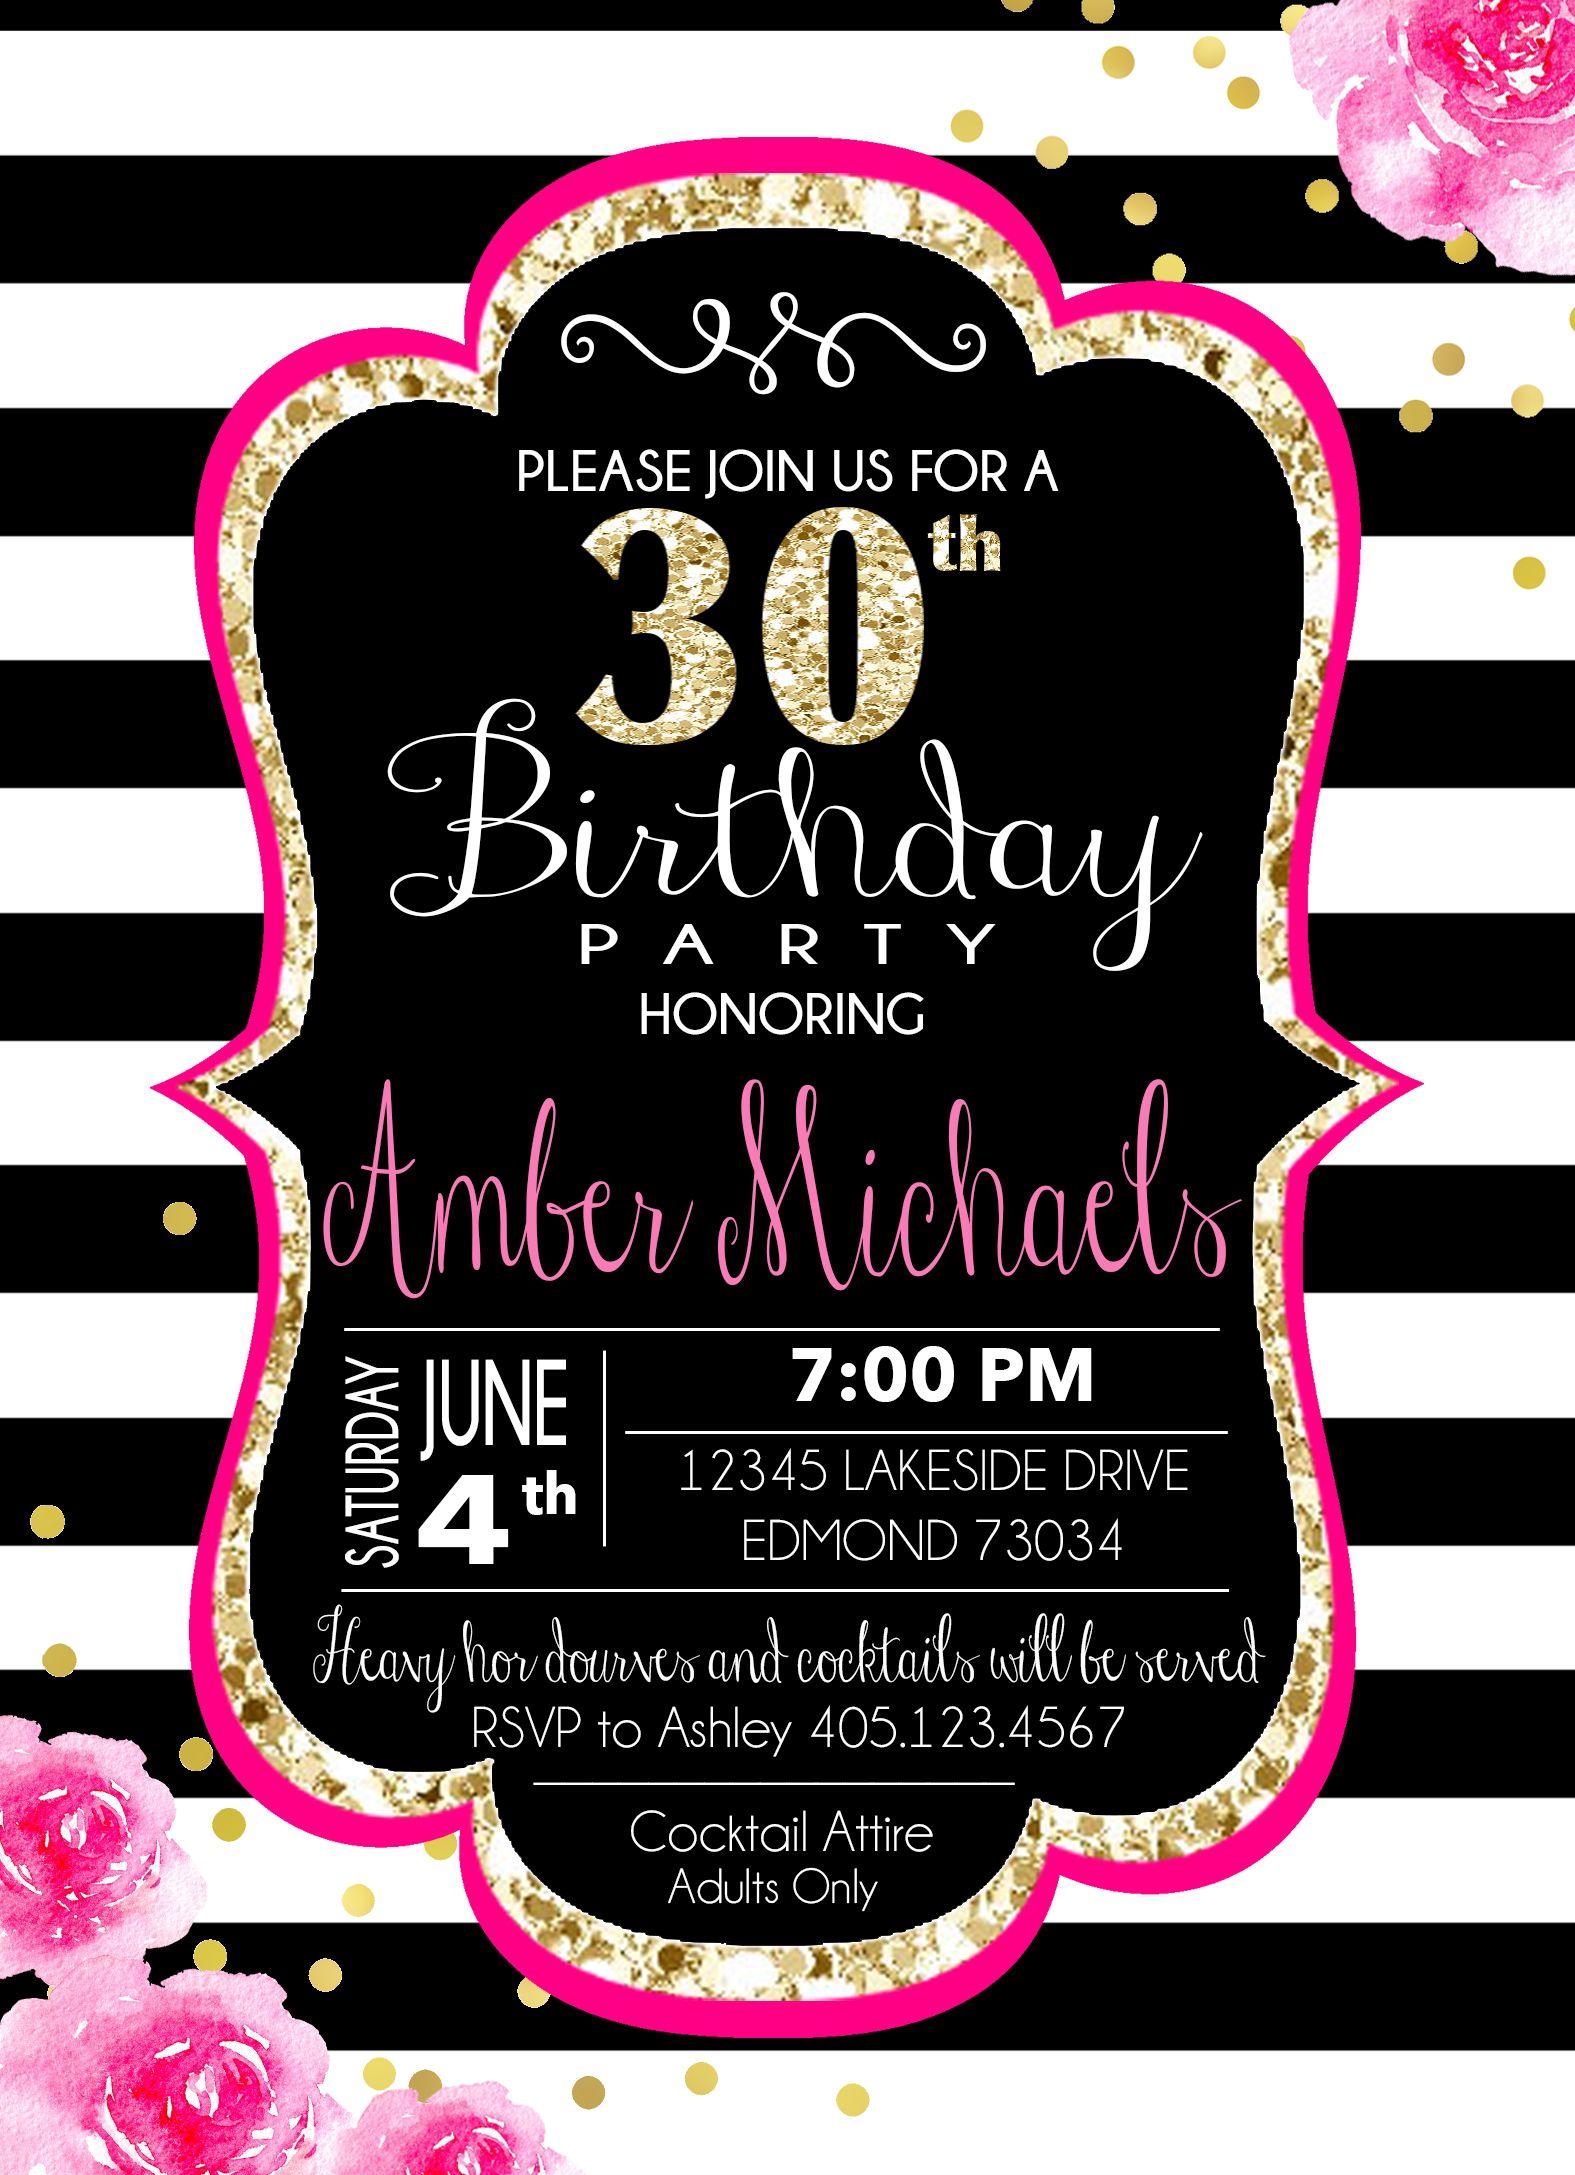 kate spade inspired birthday invitation